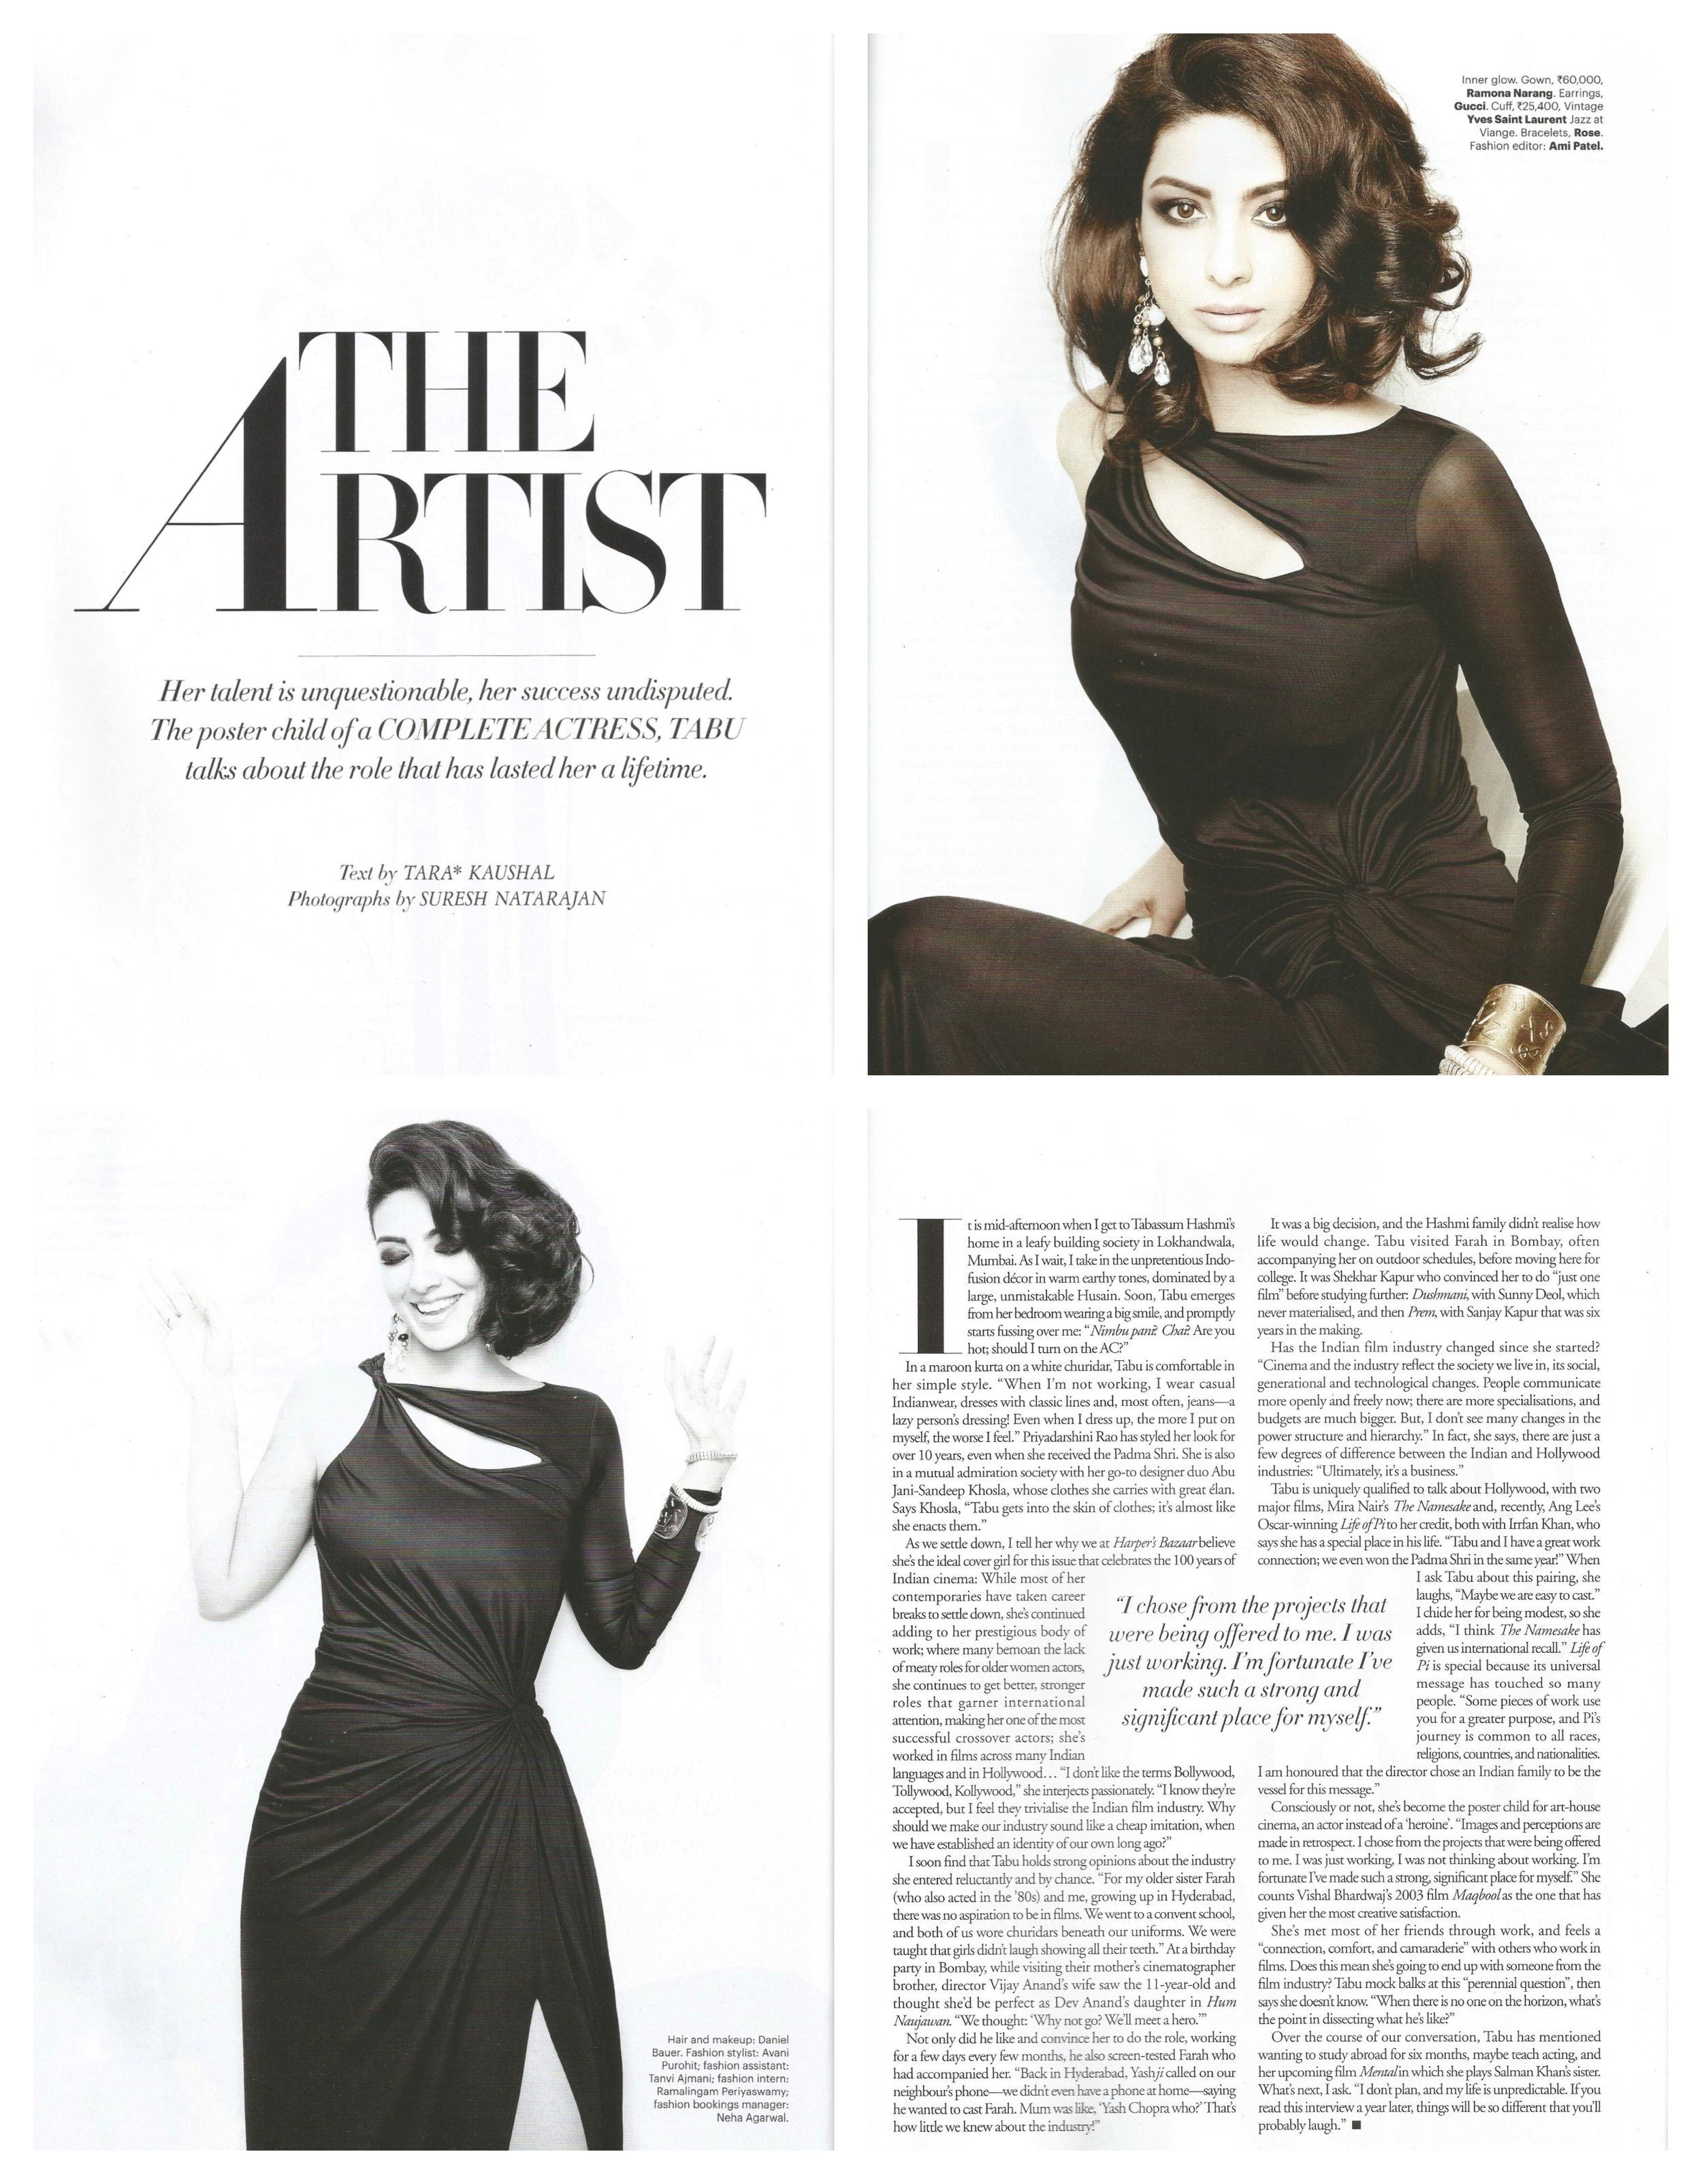 The  Harper's Bazaar  cover story.